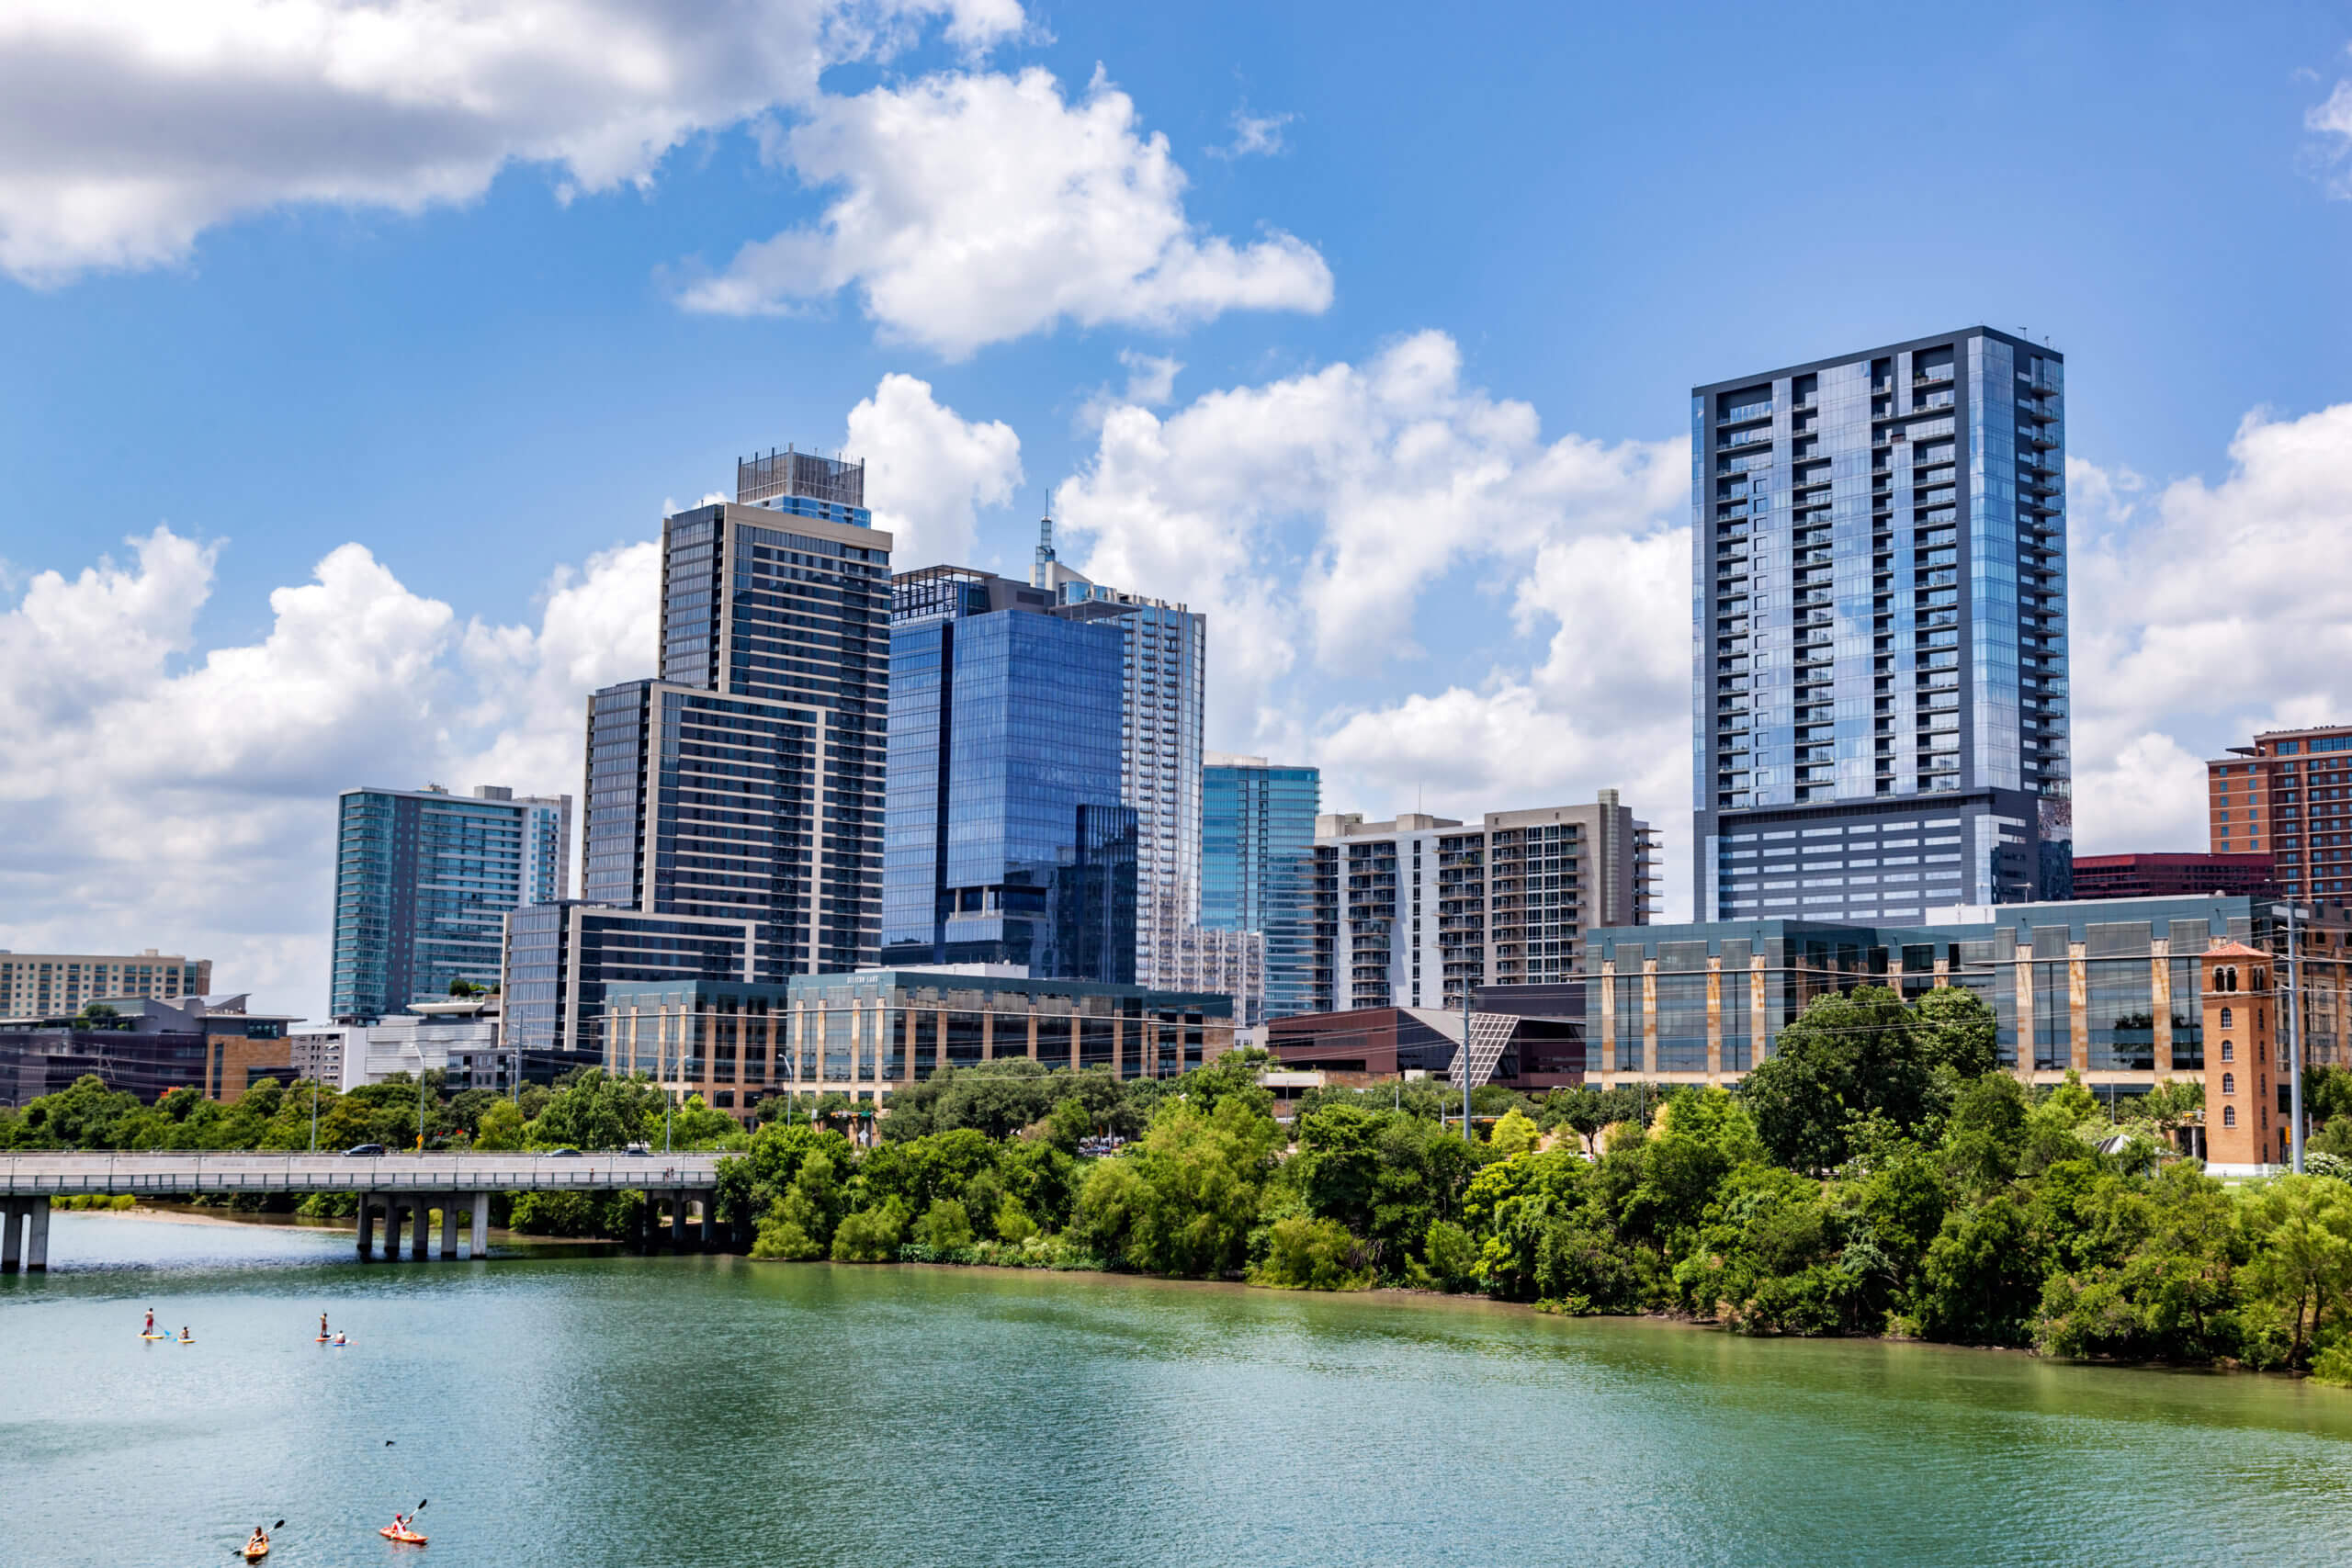 Downtown skyline of Austin, Texas, the USA. Colorado River